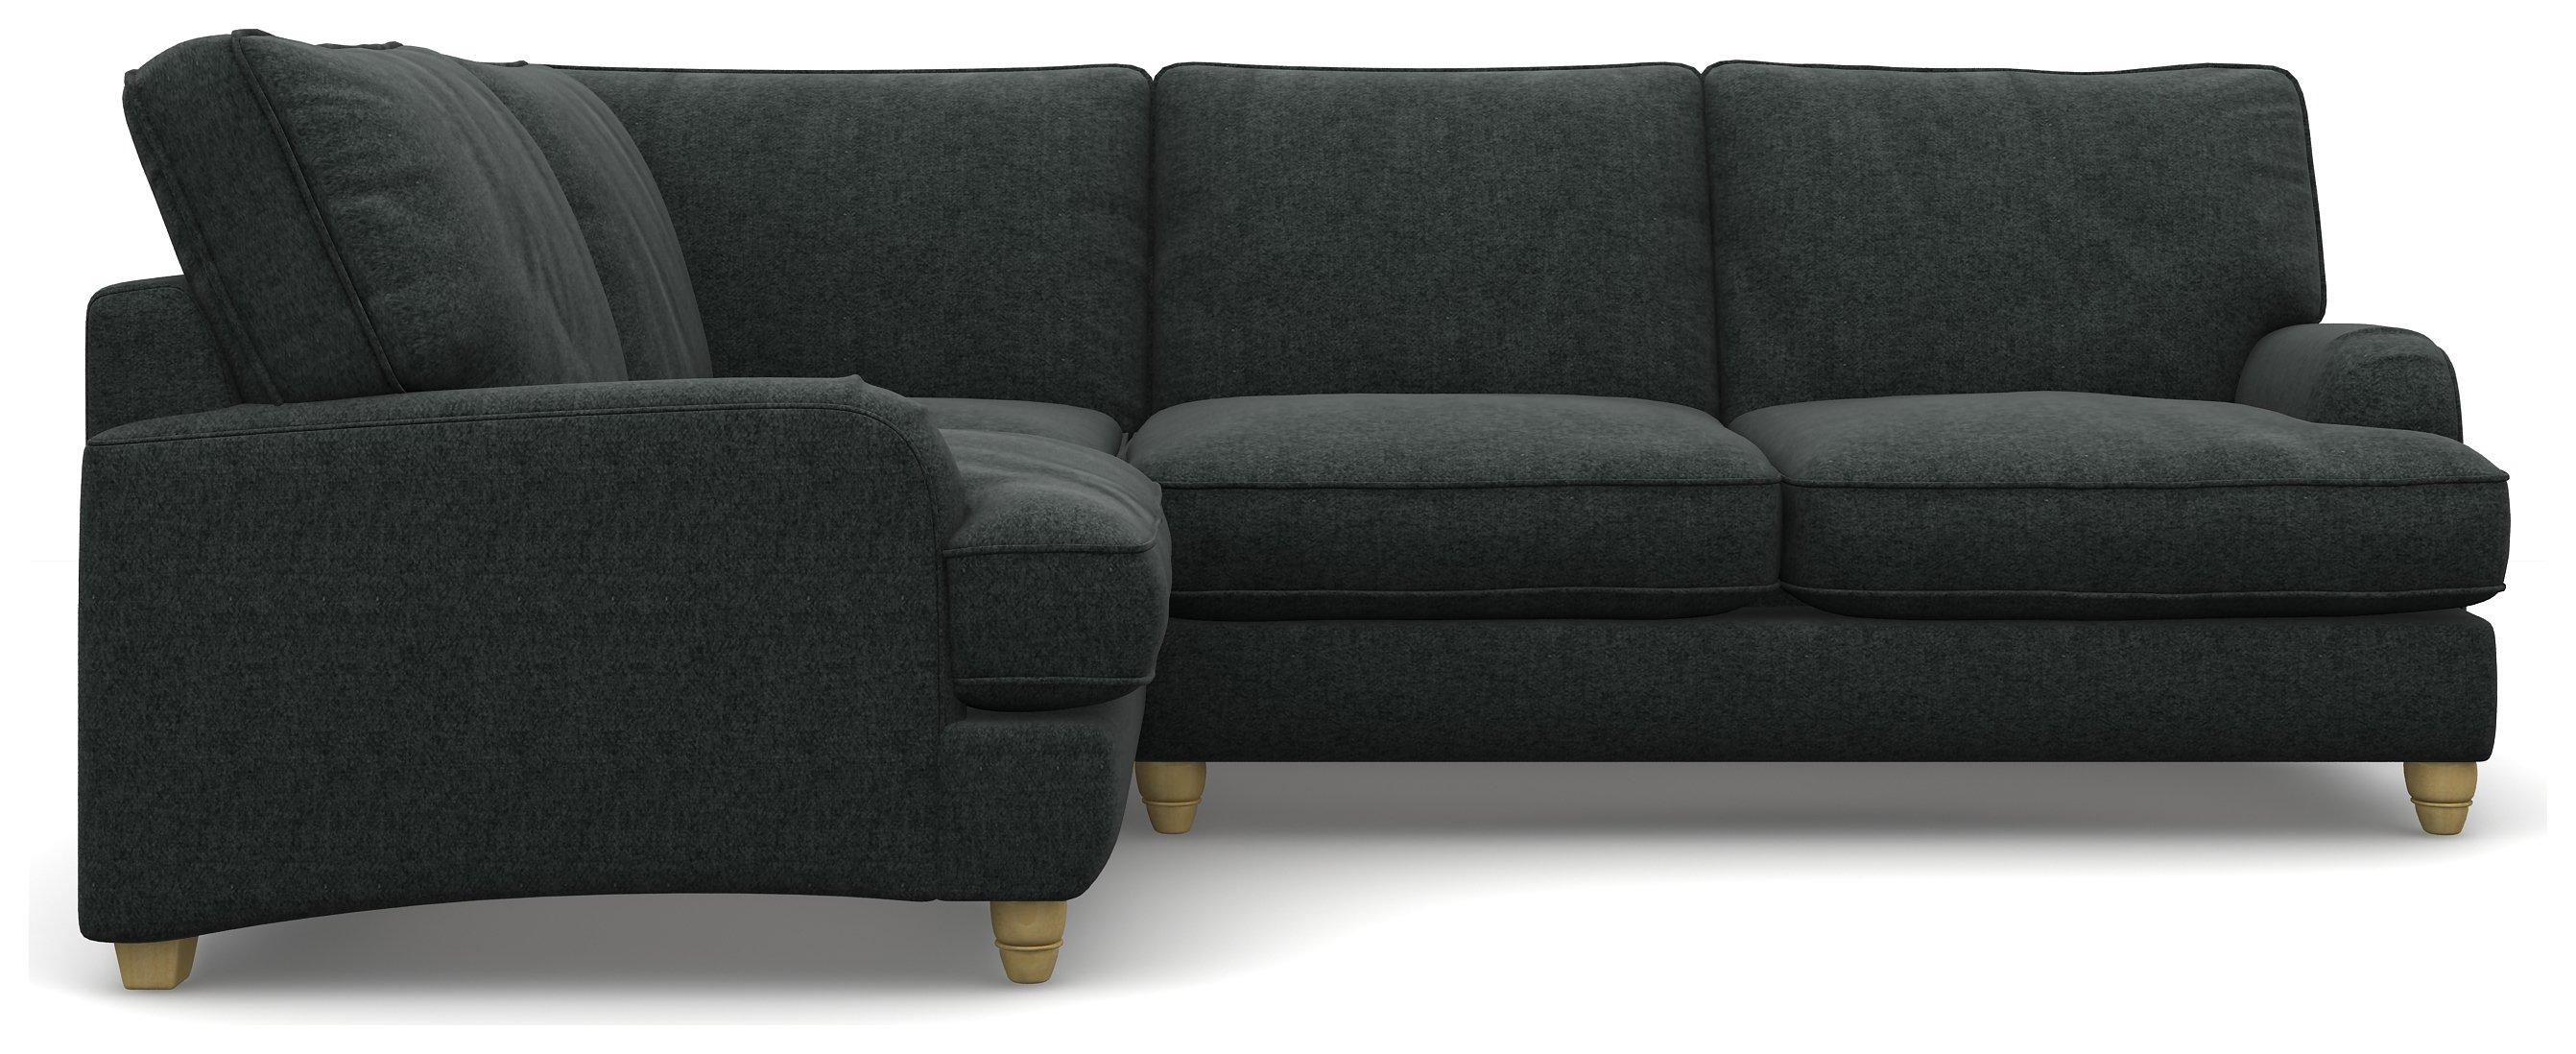 Heart of House Adeline Tweed Fabric LH Corner Sofa -Charcoal